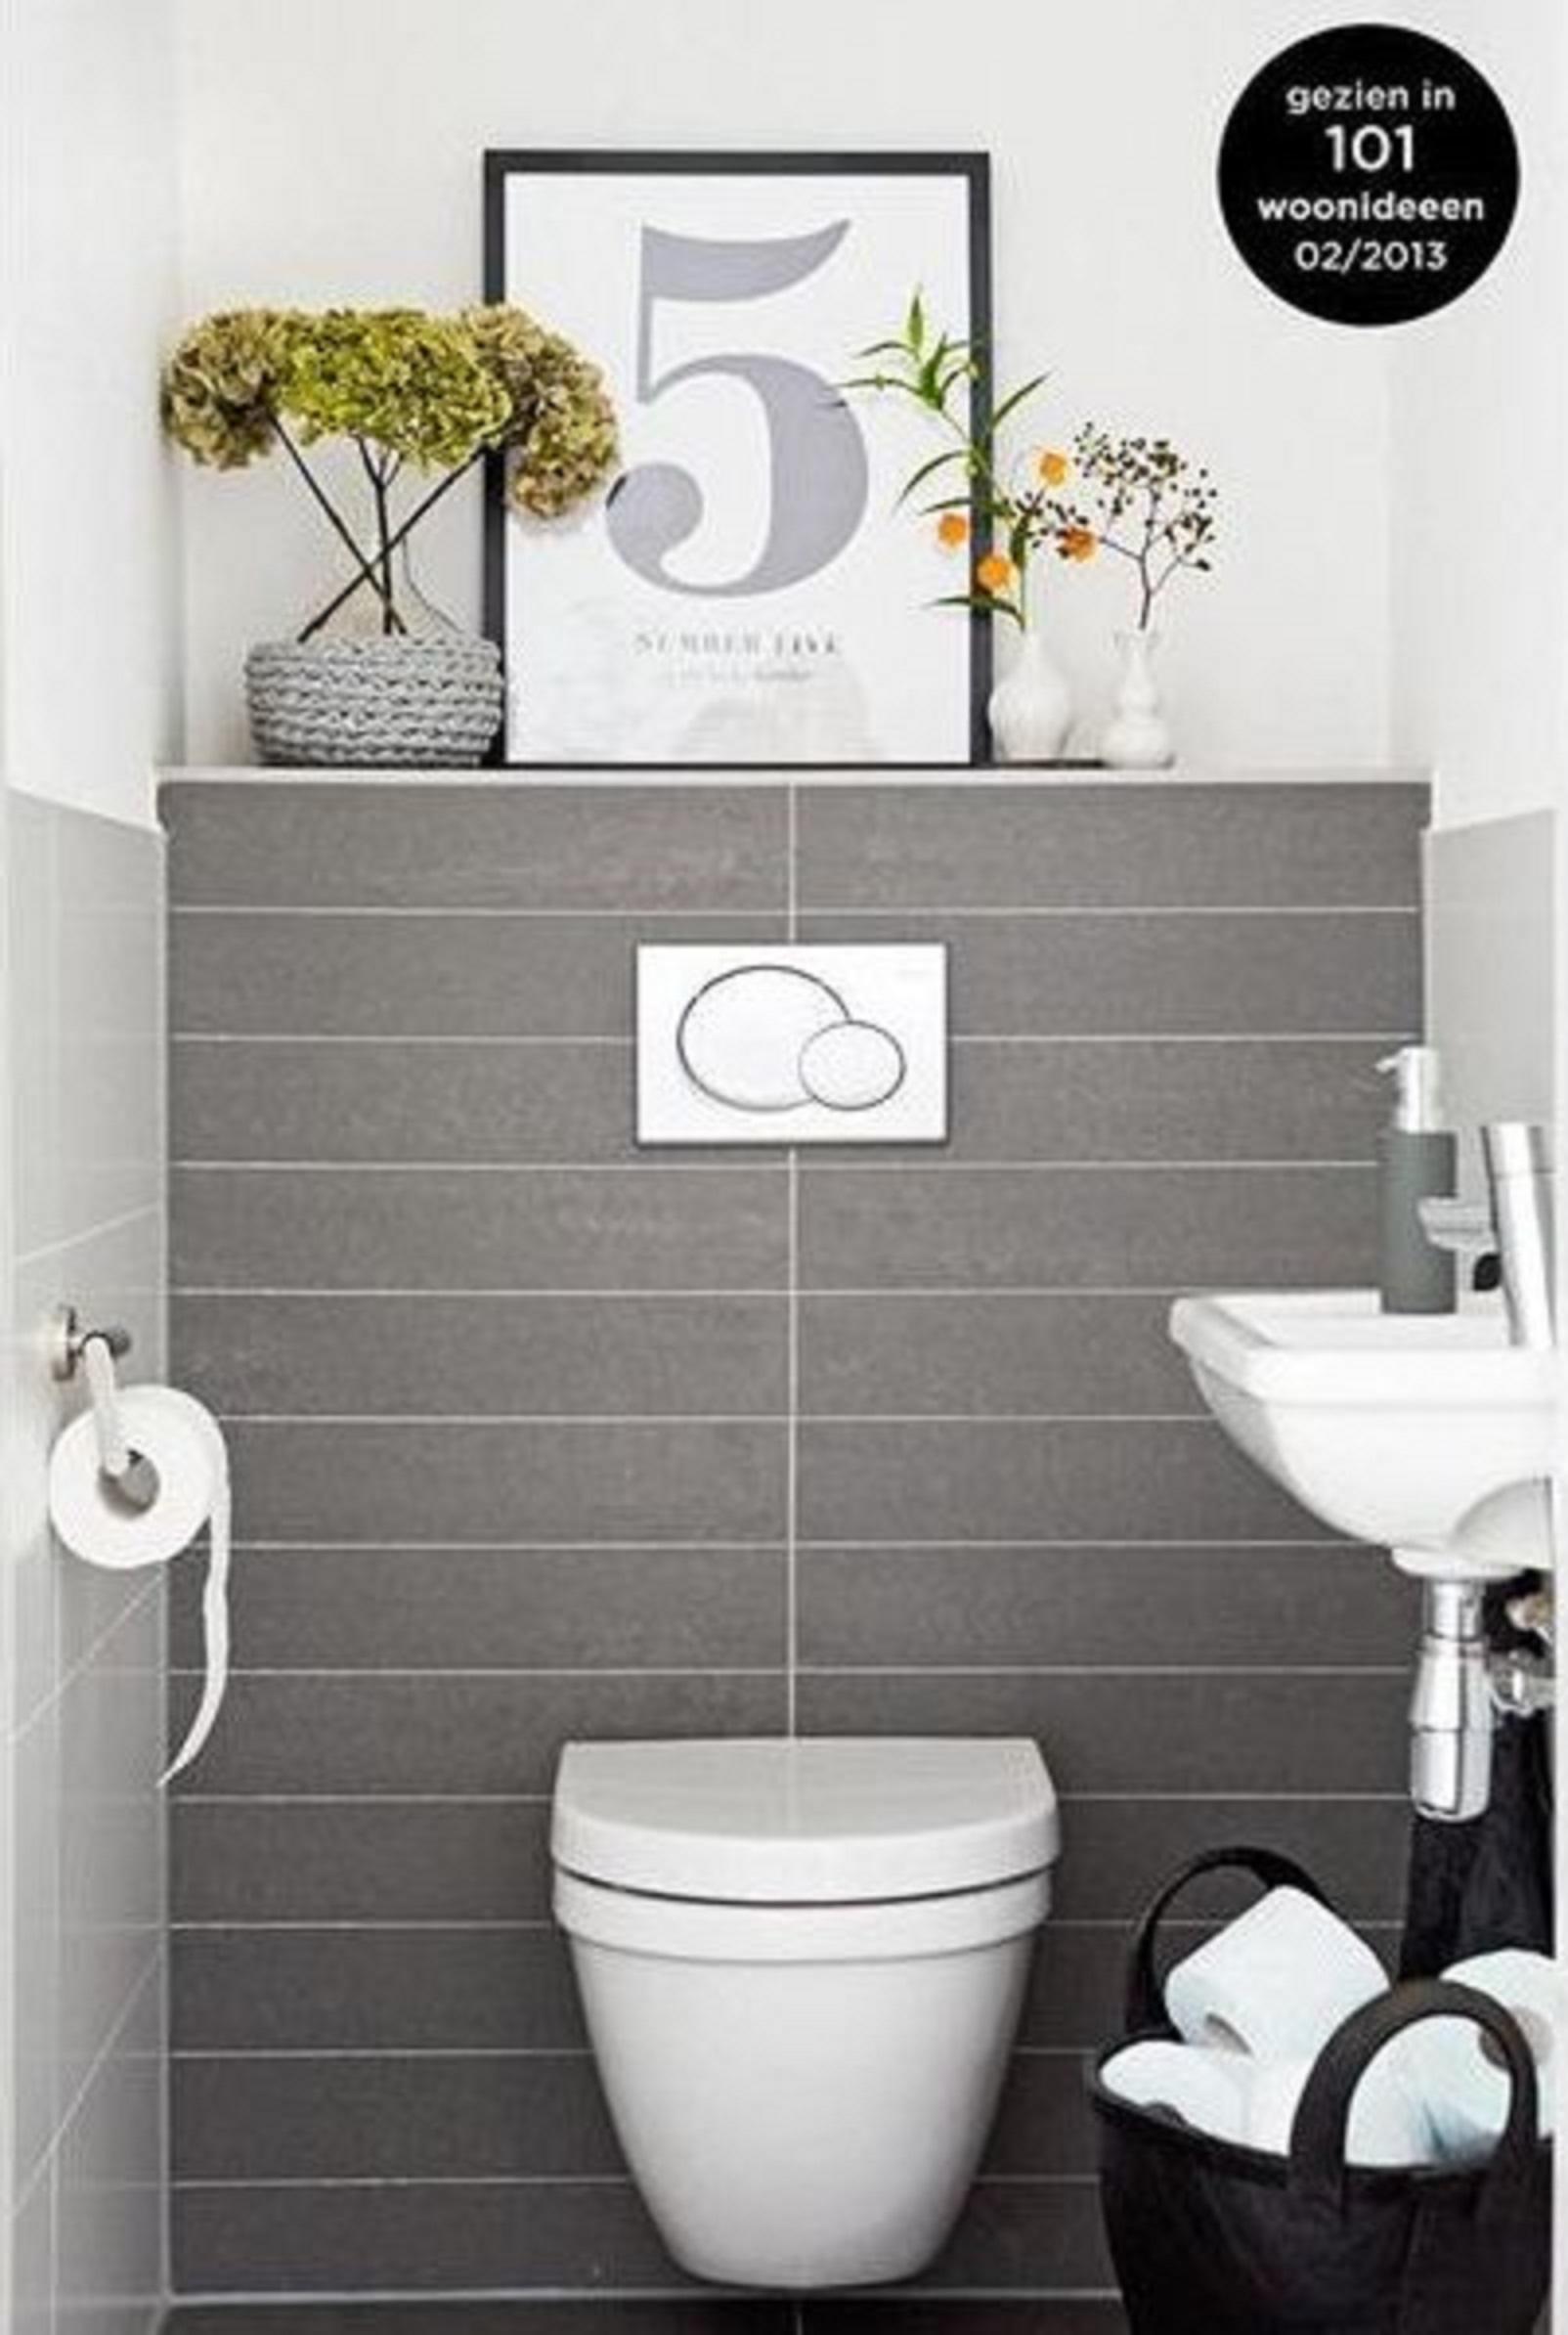 Casa de banho pequena sem problema - Voorbeeld deco wc ...